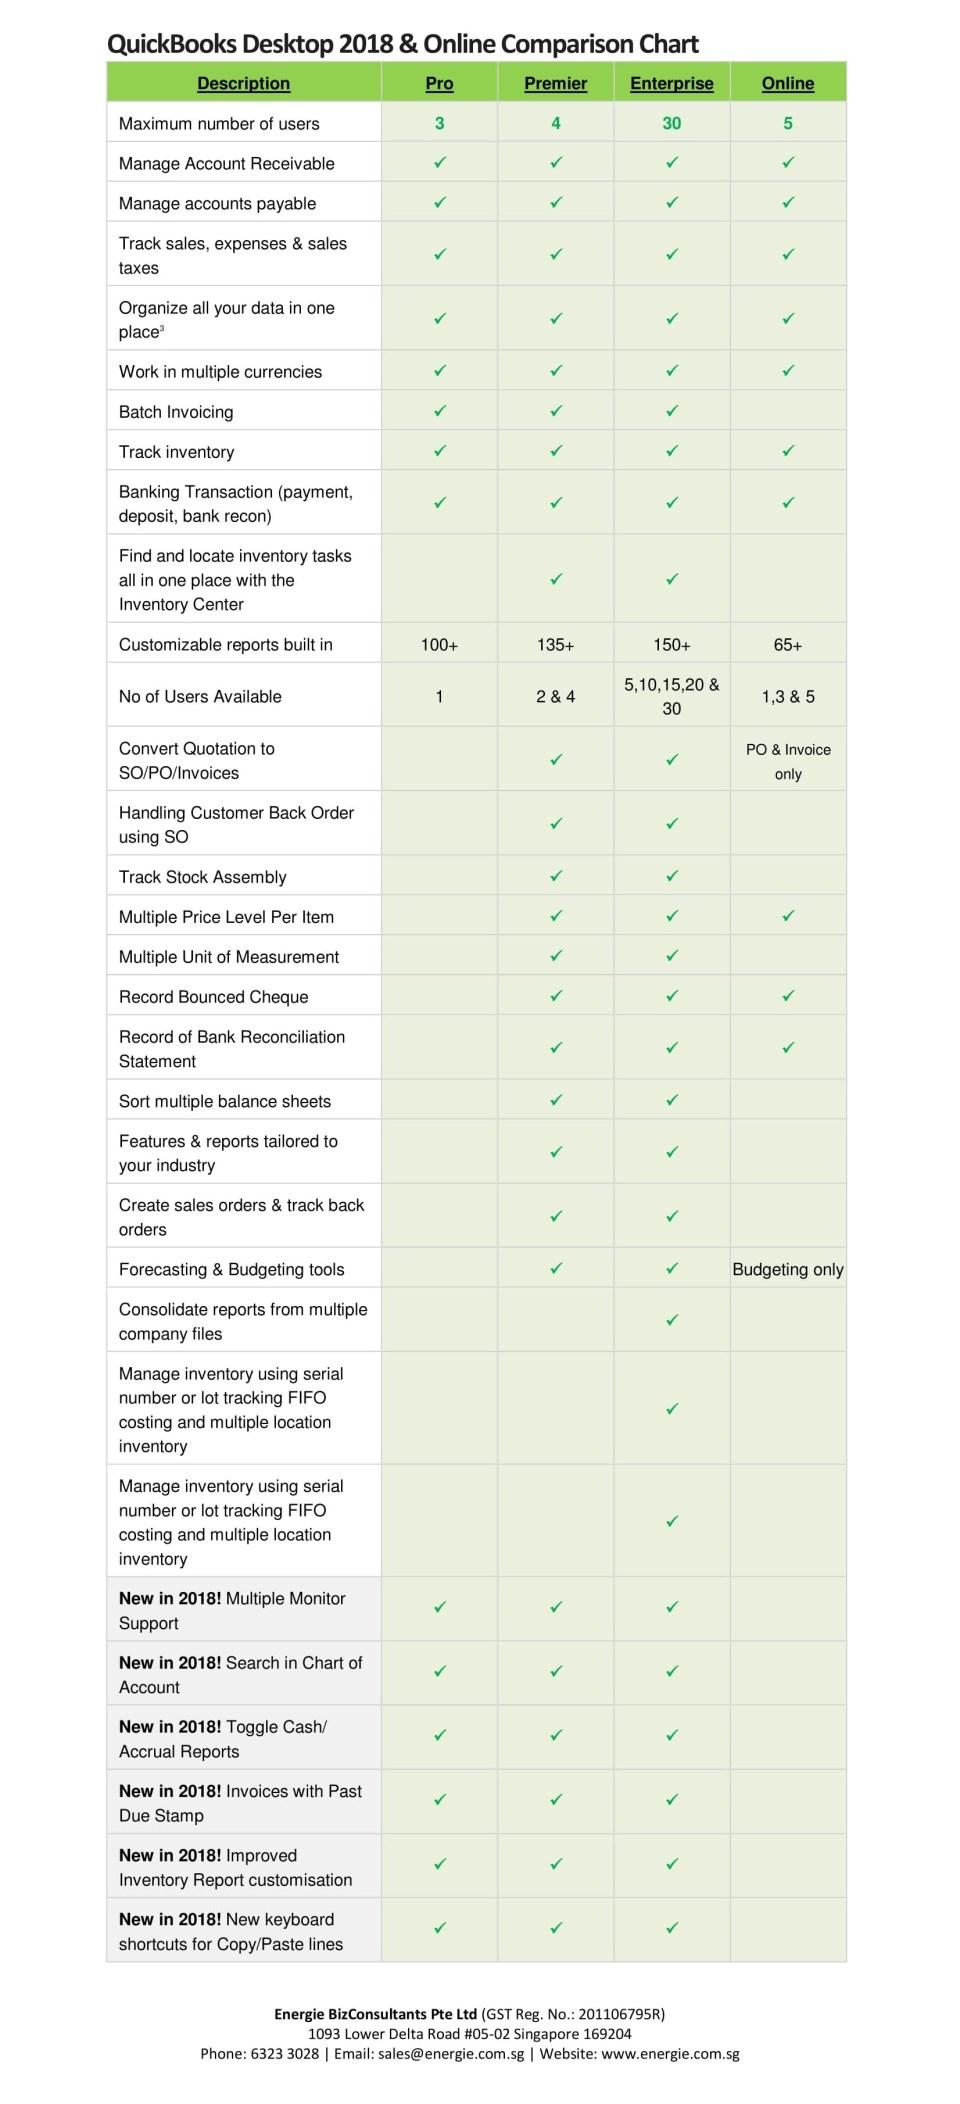 QuickBooks 2018 - Desktop vs Online